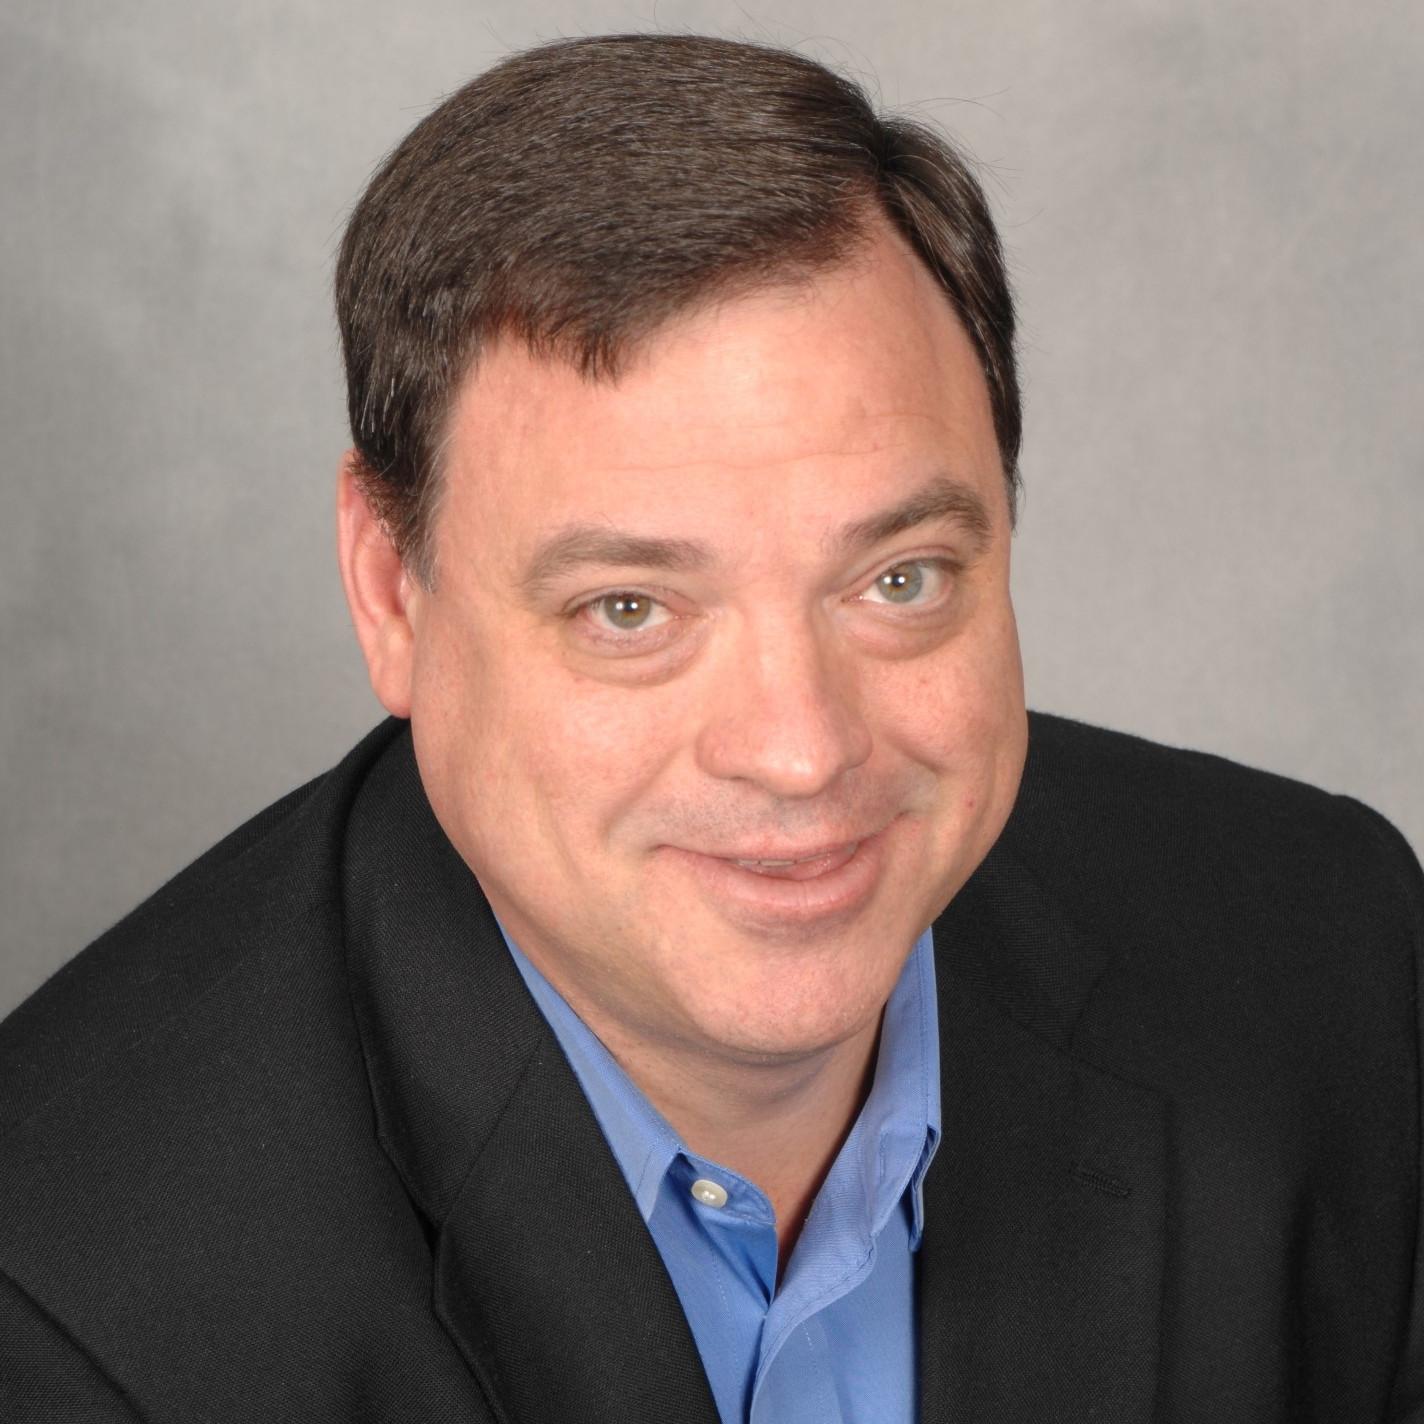 Rev. Dr. Rob Nash